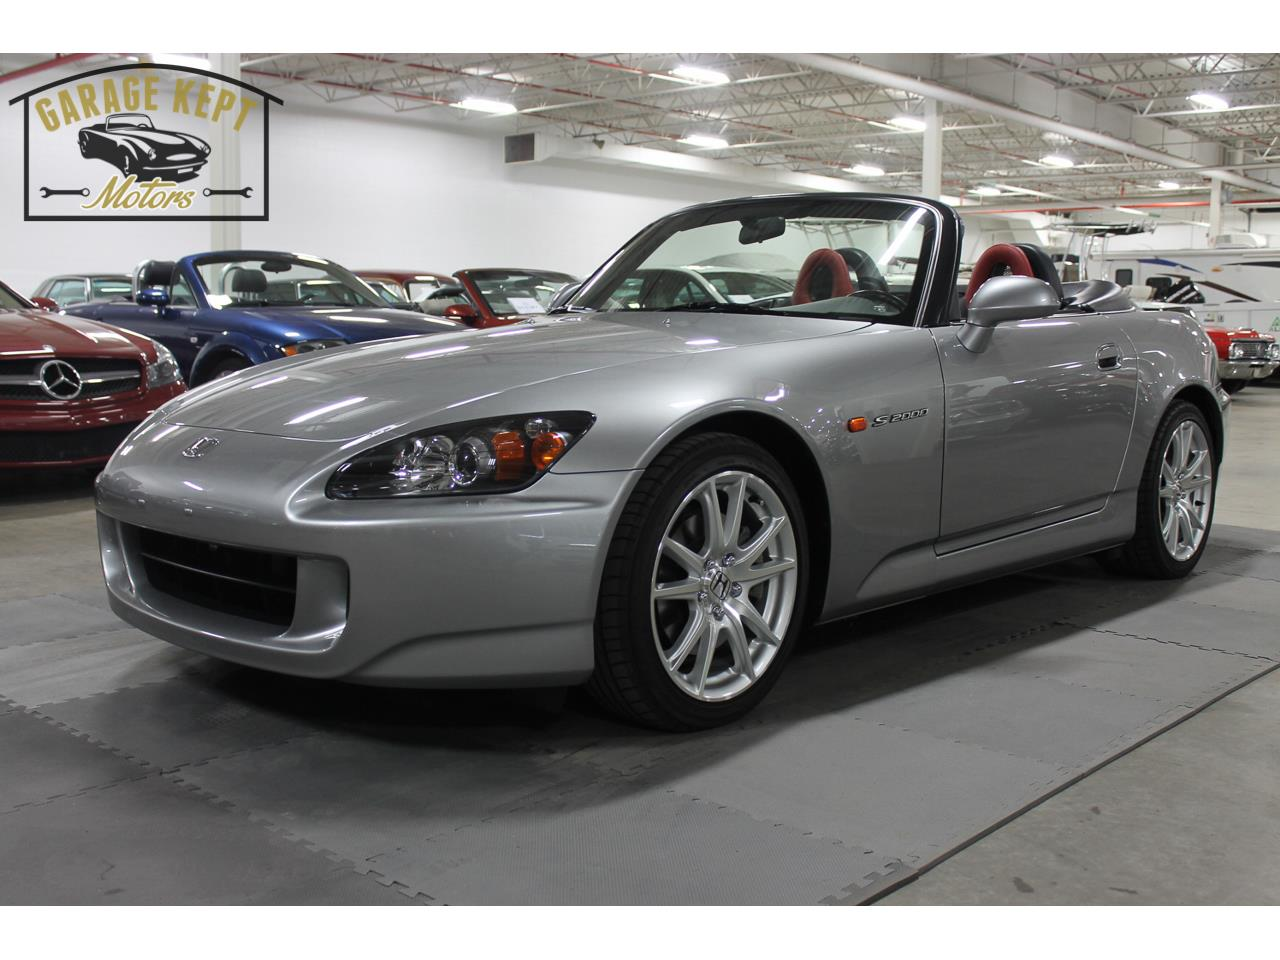 For Sale: 2005 Honda S2000 In Grand Rapids, Michigan